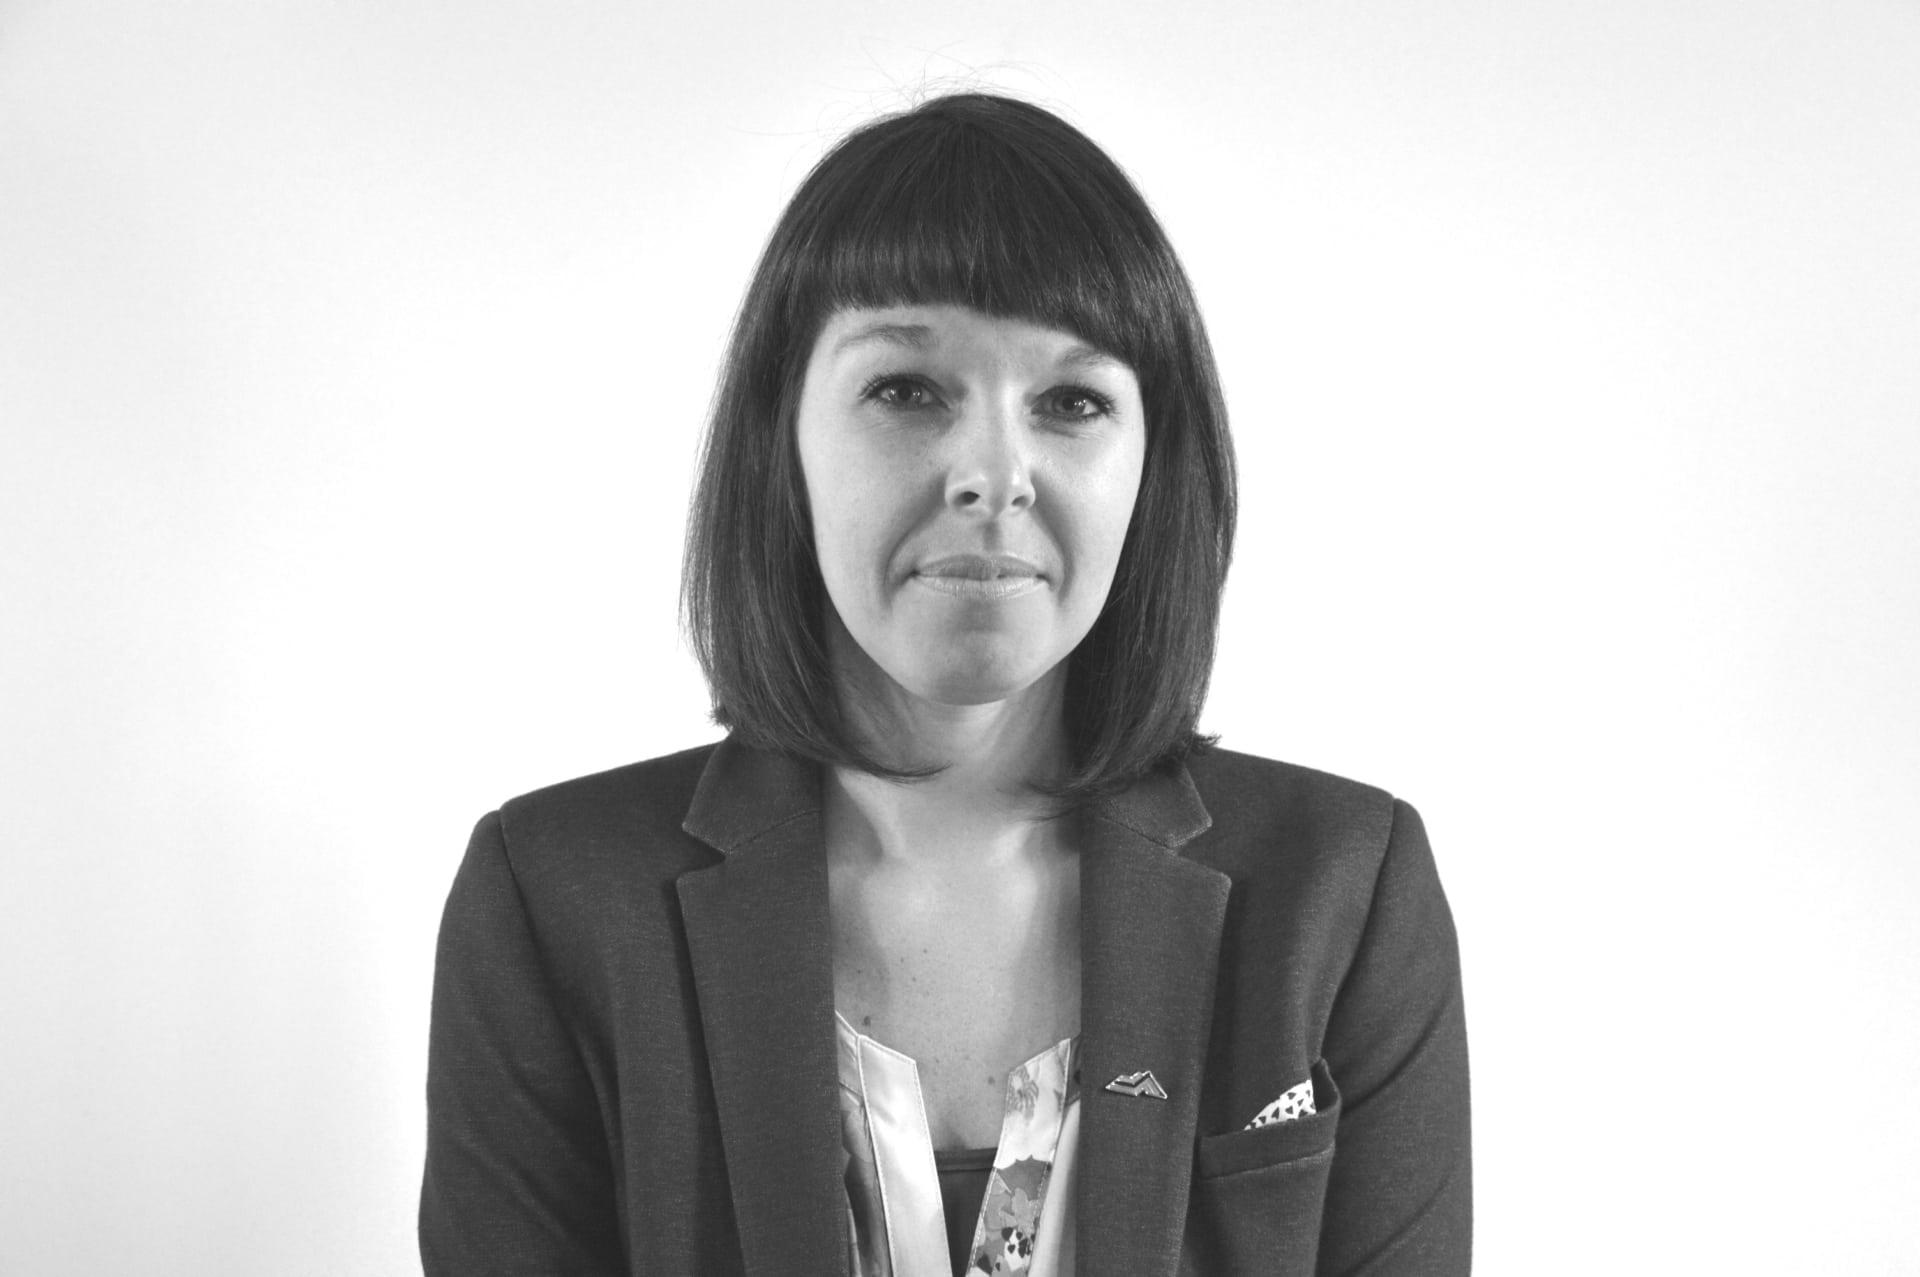 Daniela Fessel